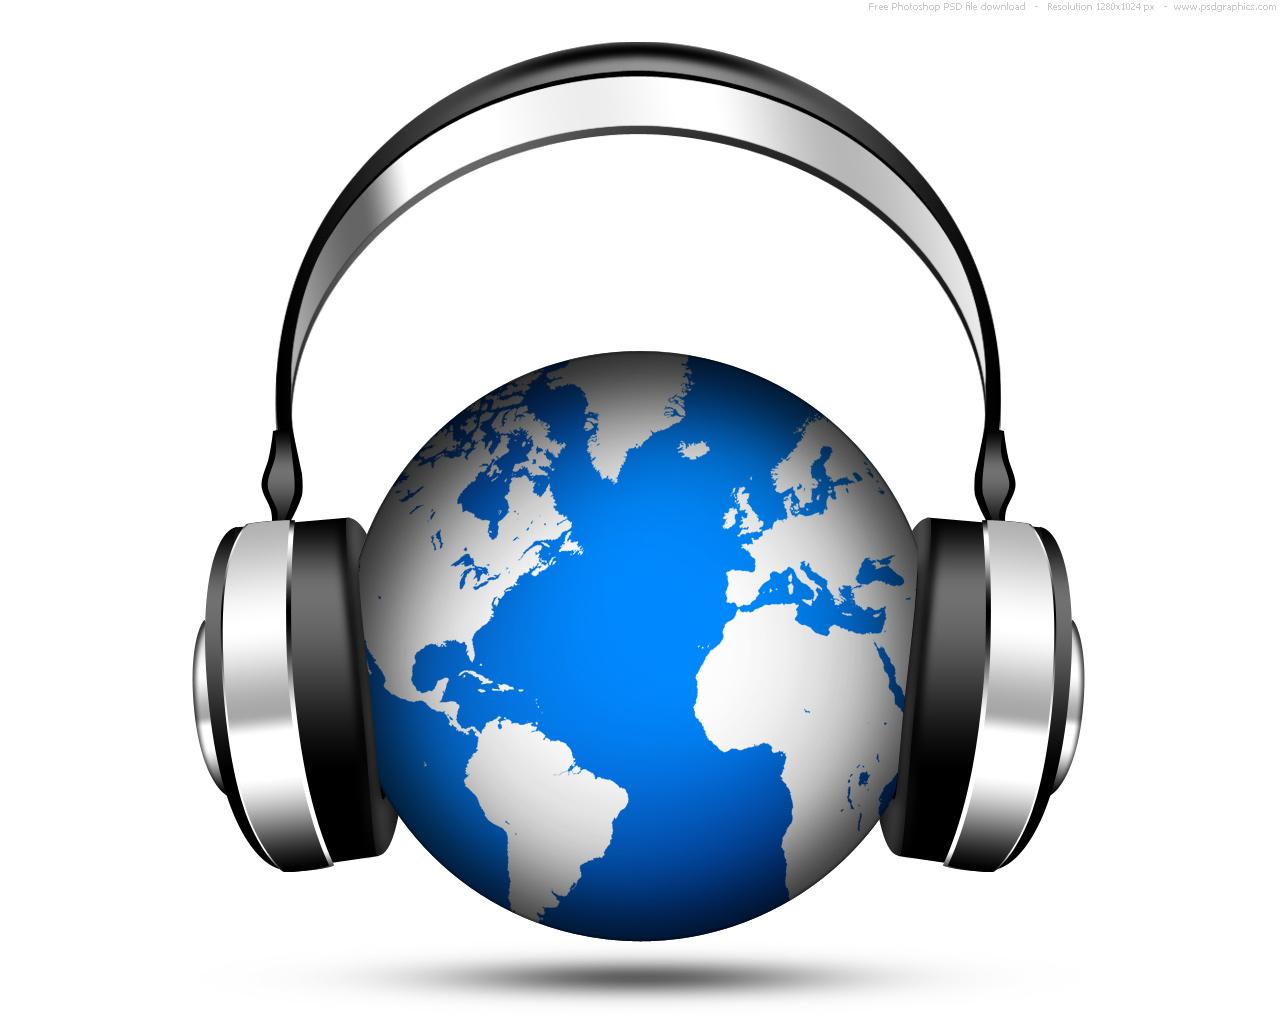 http://1.bp.blogspot.com/-x2Br8_EY50E/Ti4J4E66XsI/AAAAAAAAAK4/XRoMw4Sb9CA/s1600/world-music-icon.jpg